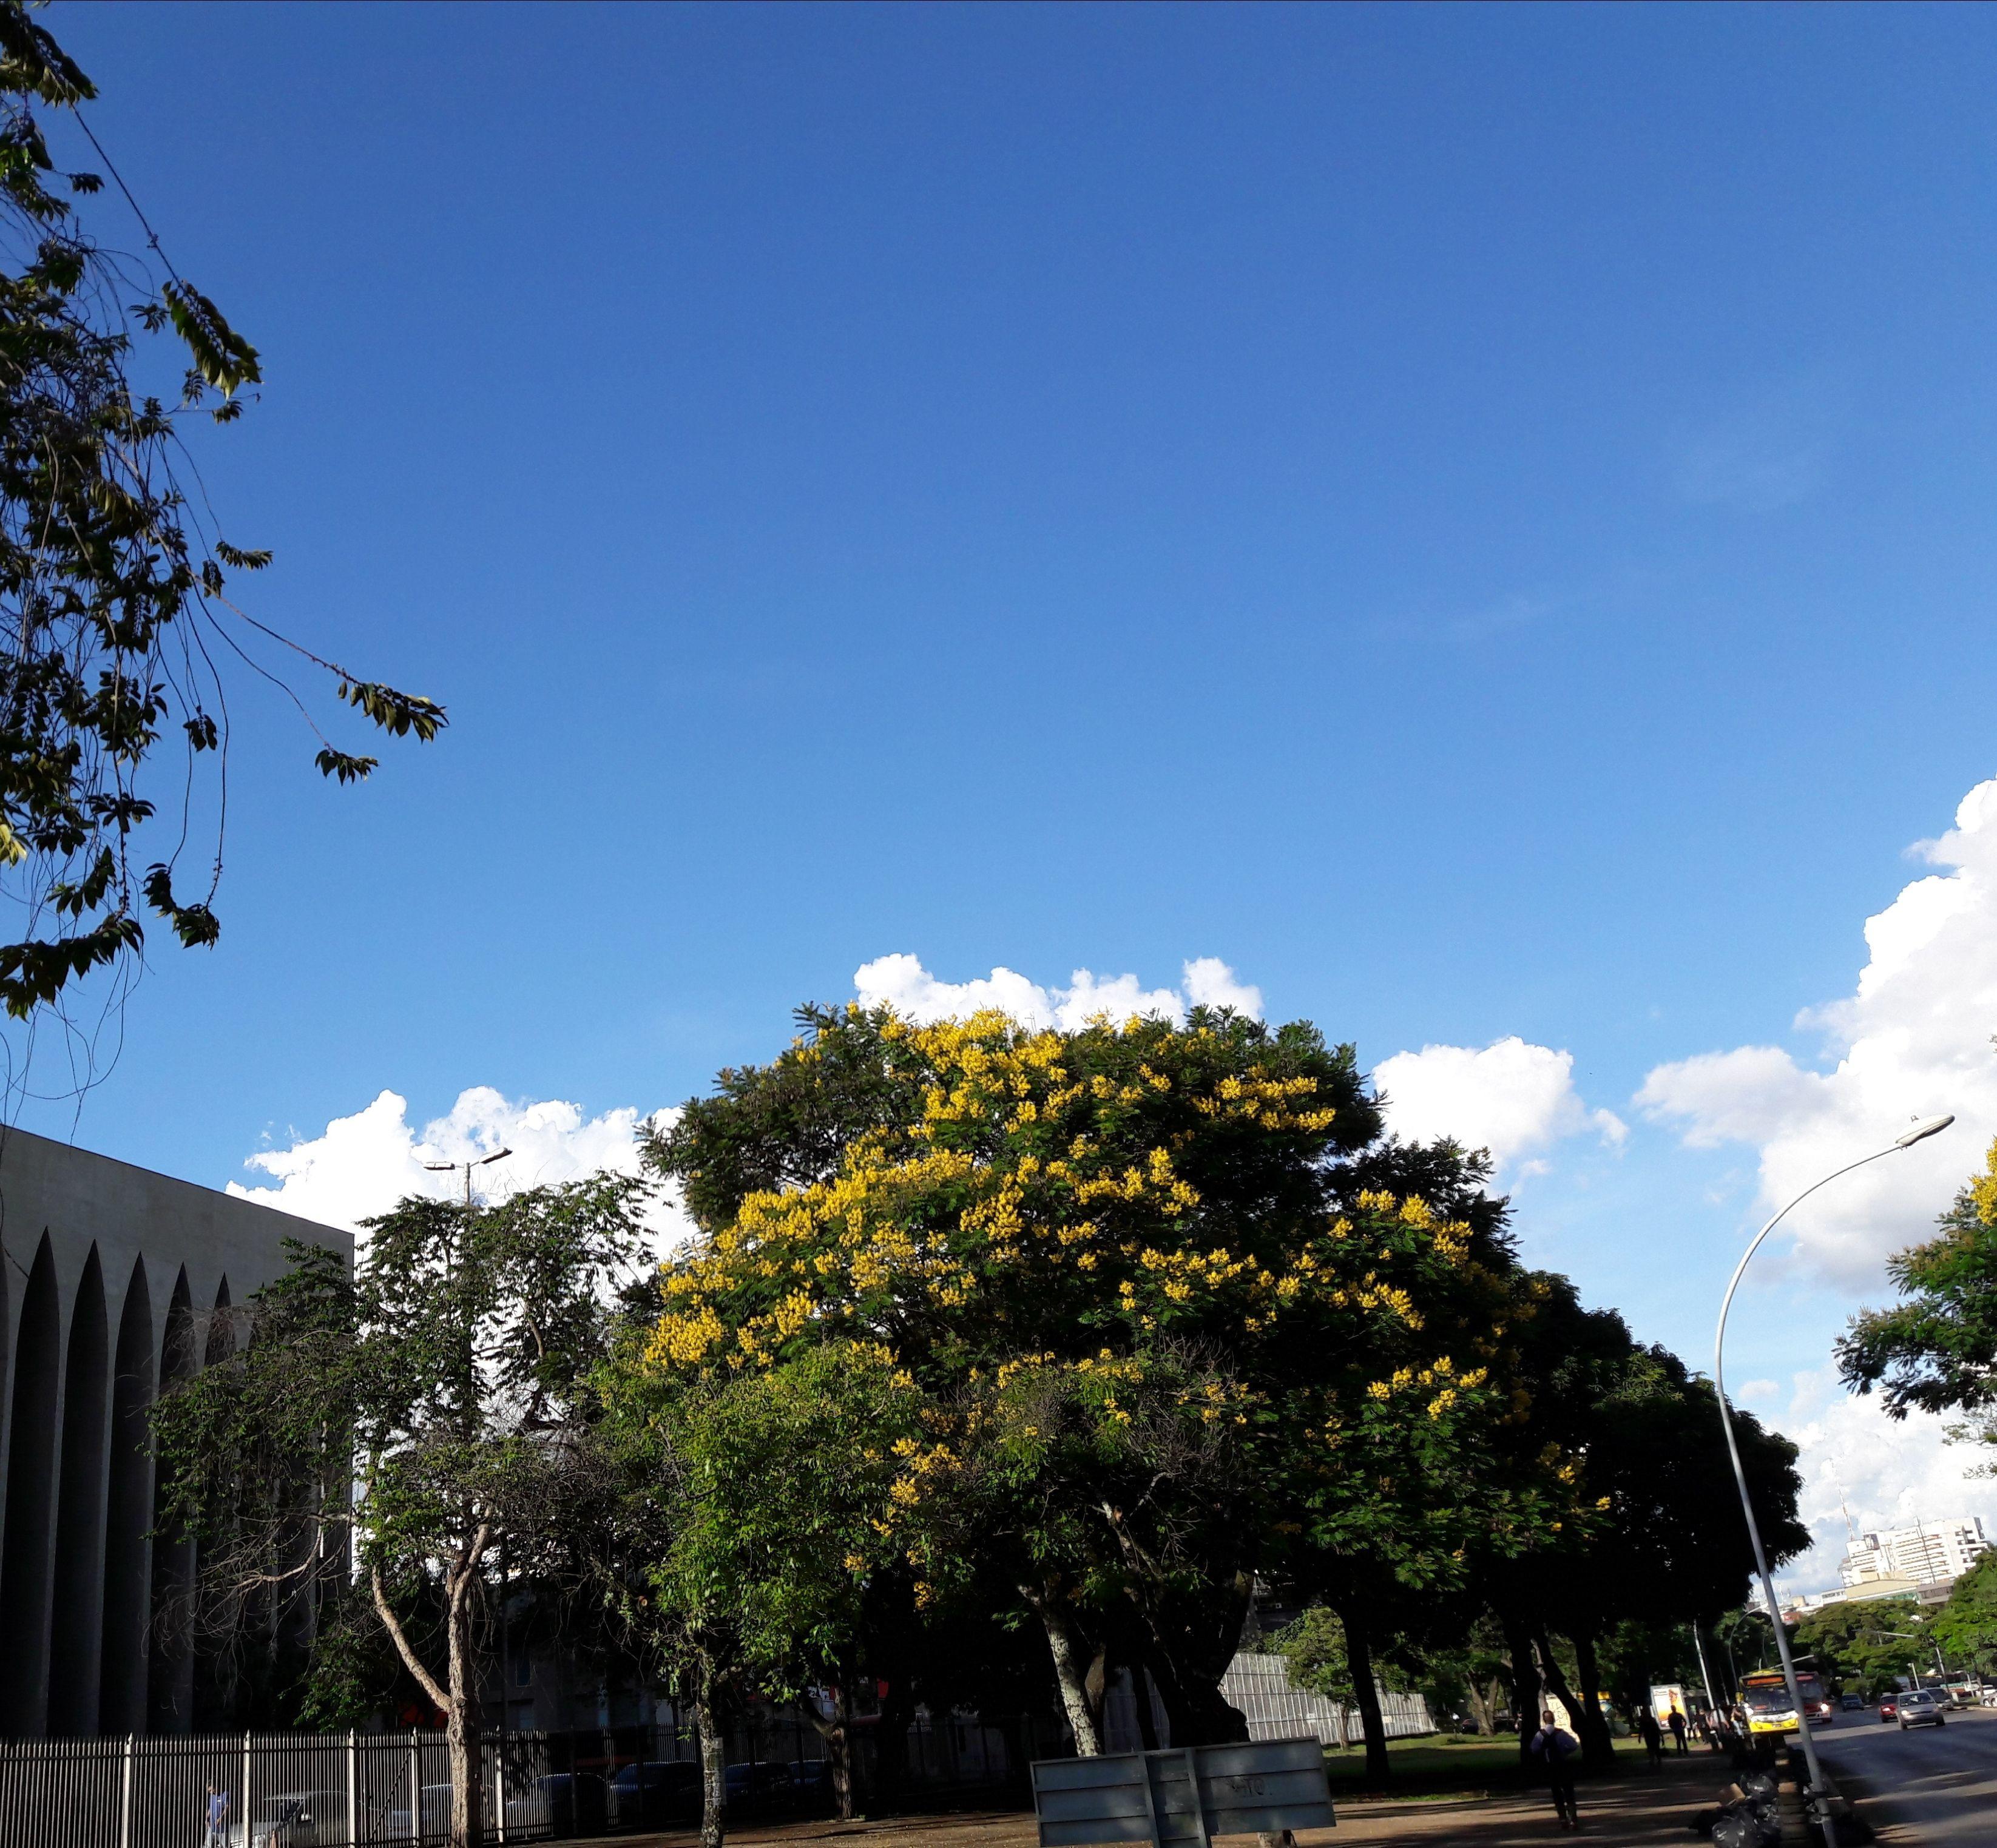 DF_Brasília por Wilan Nascimento 9-1-18 sol e calor